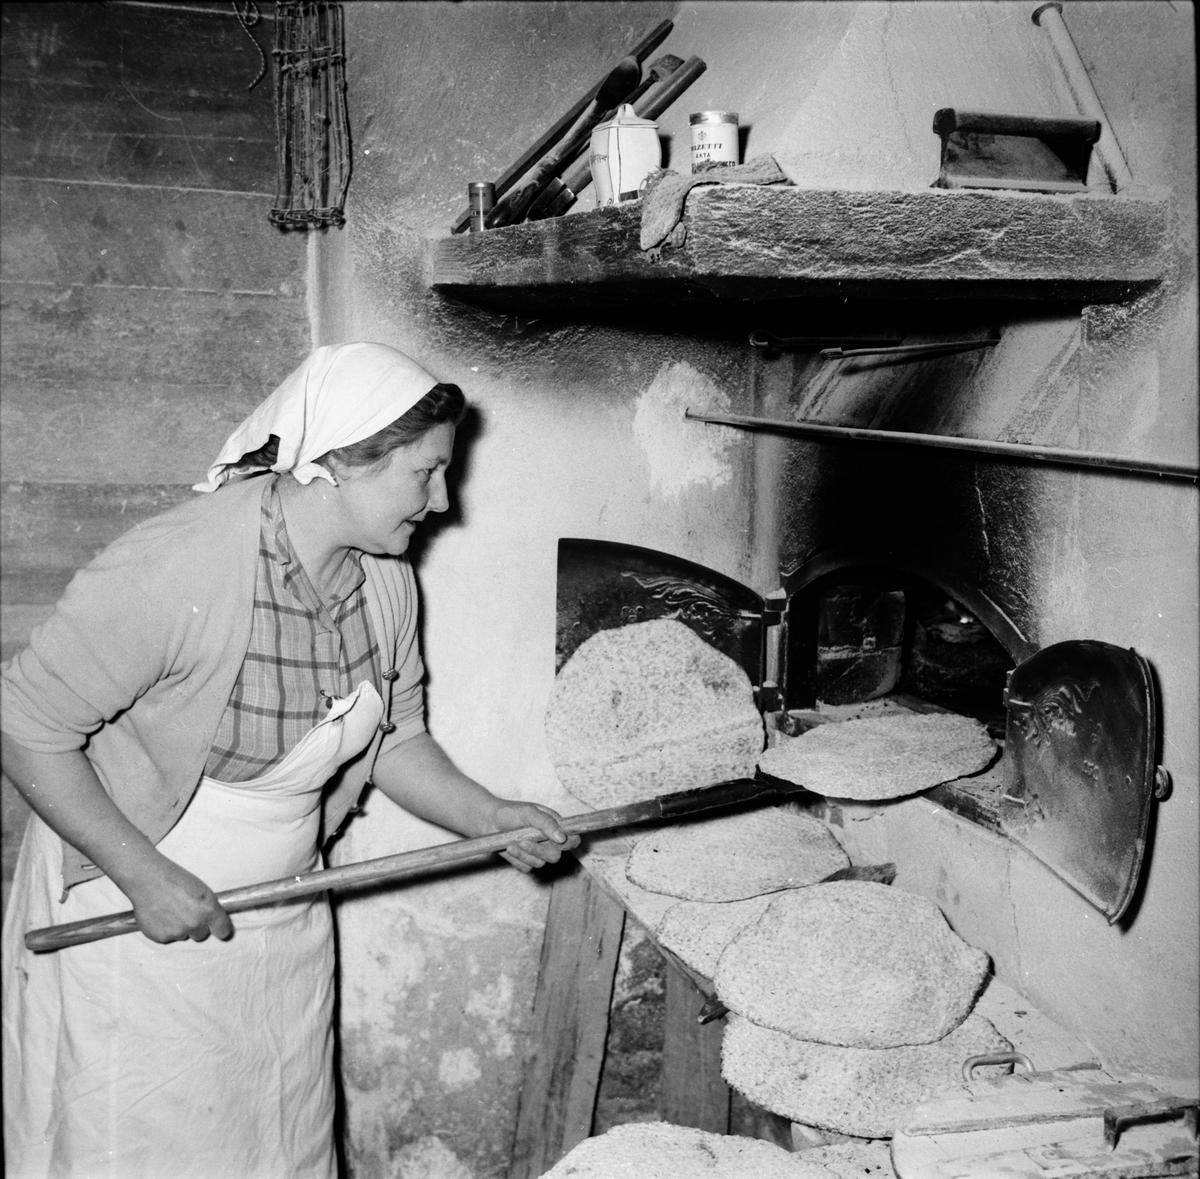 Bakerska Maria Persson. Ovanåkersbröd. Edsbyn december 1956.